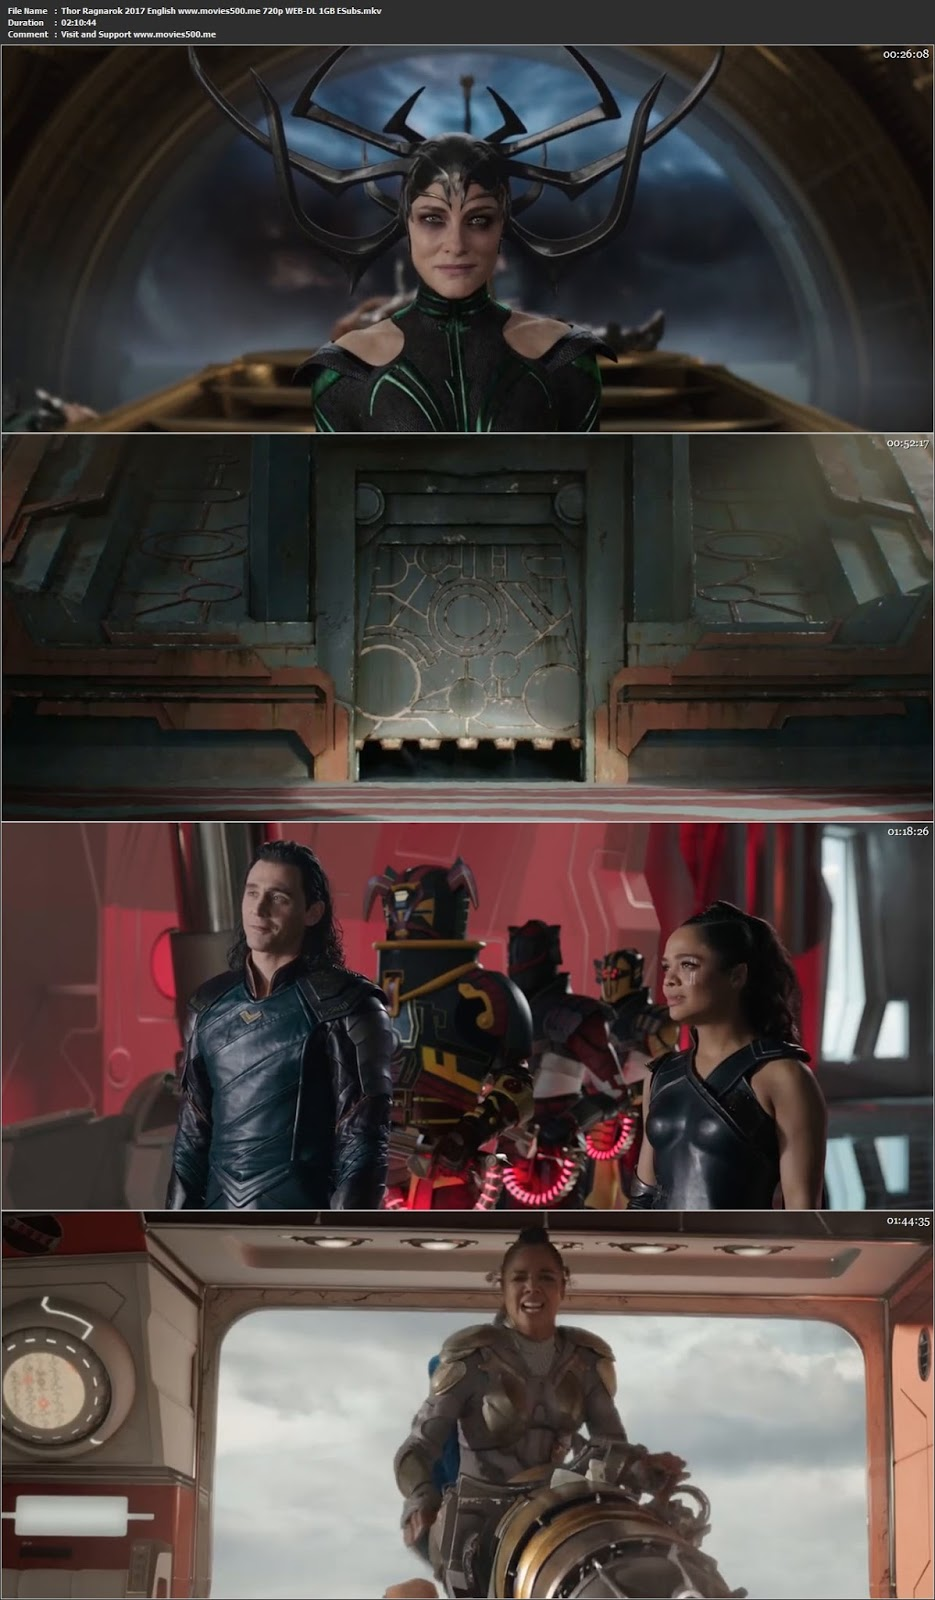 Thor Ragnarok 2017 Dual Audio Hind Movie WEB DL 720p 1GB at movies500.site